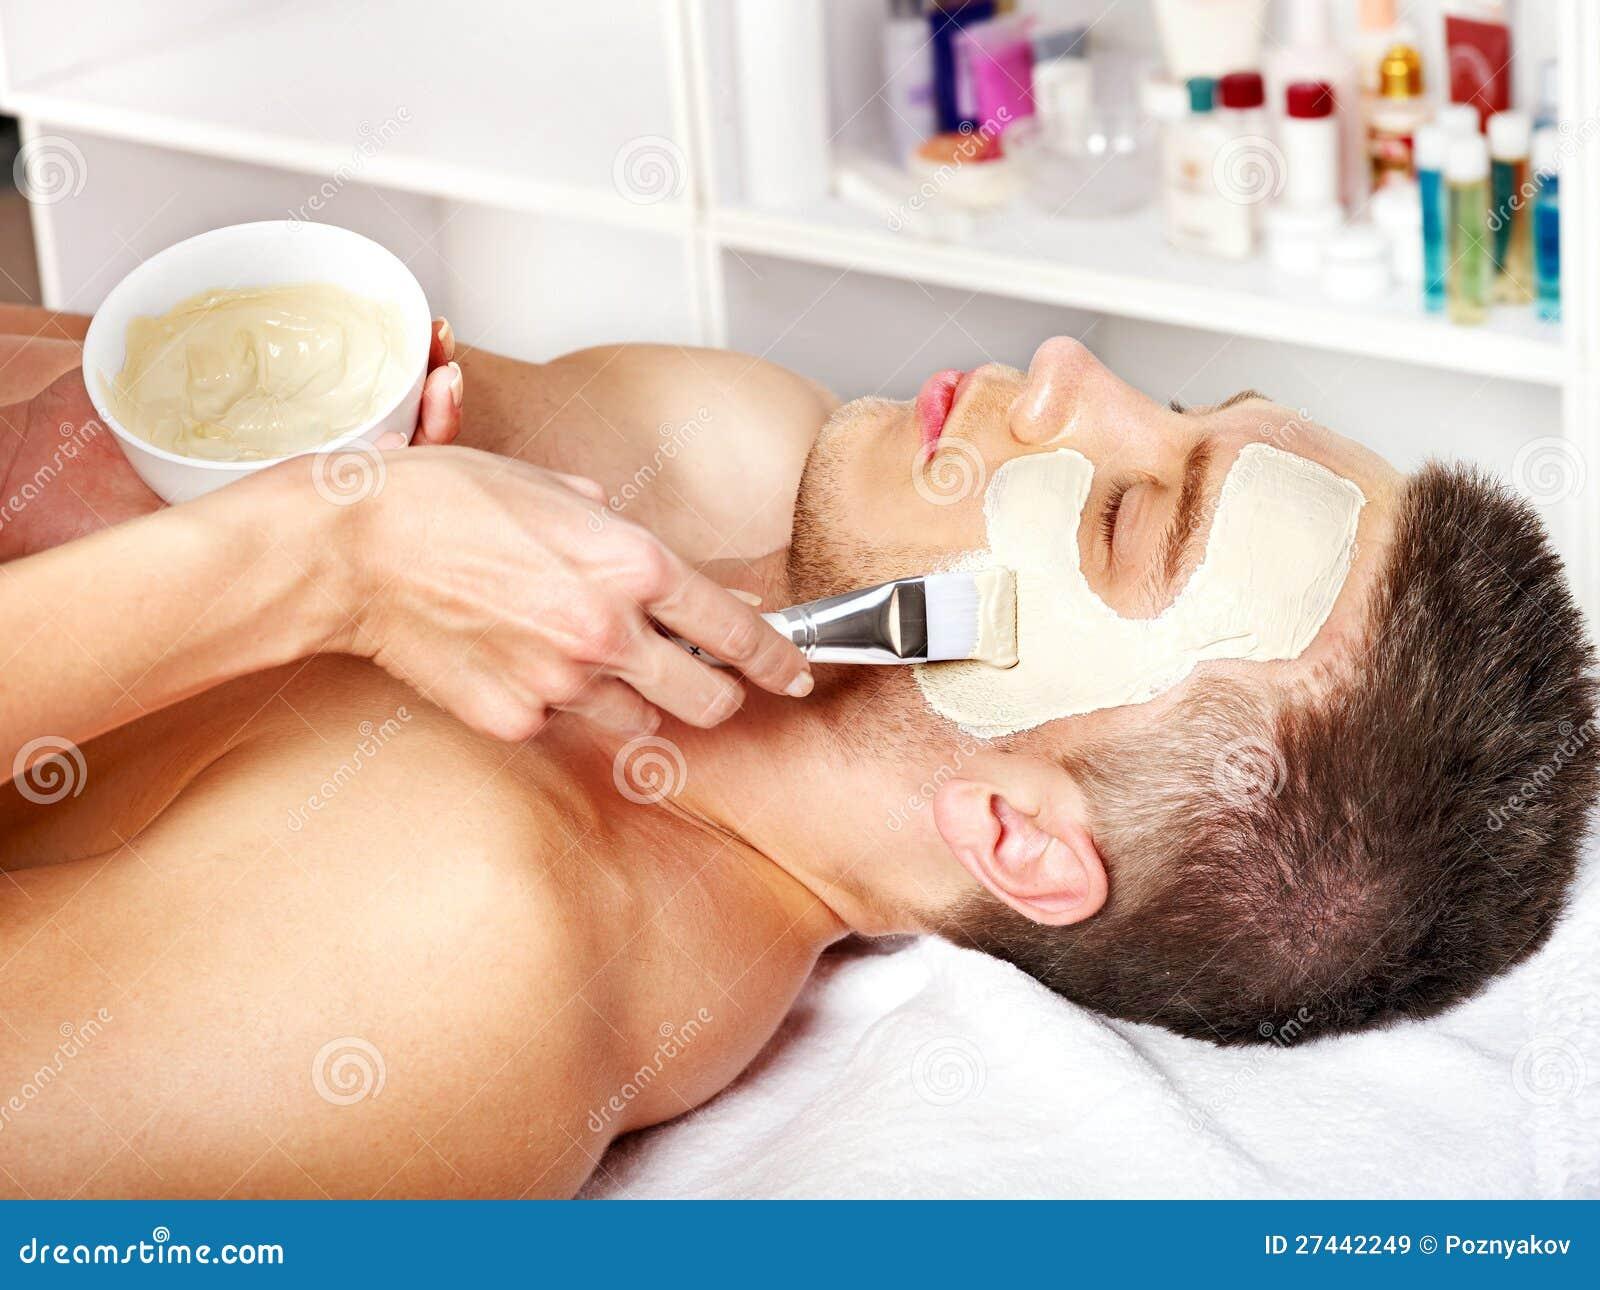 beauty spa gratis kontakt